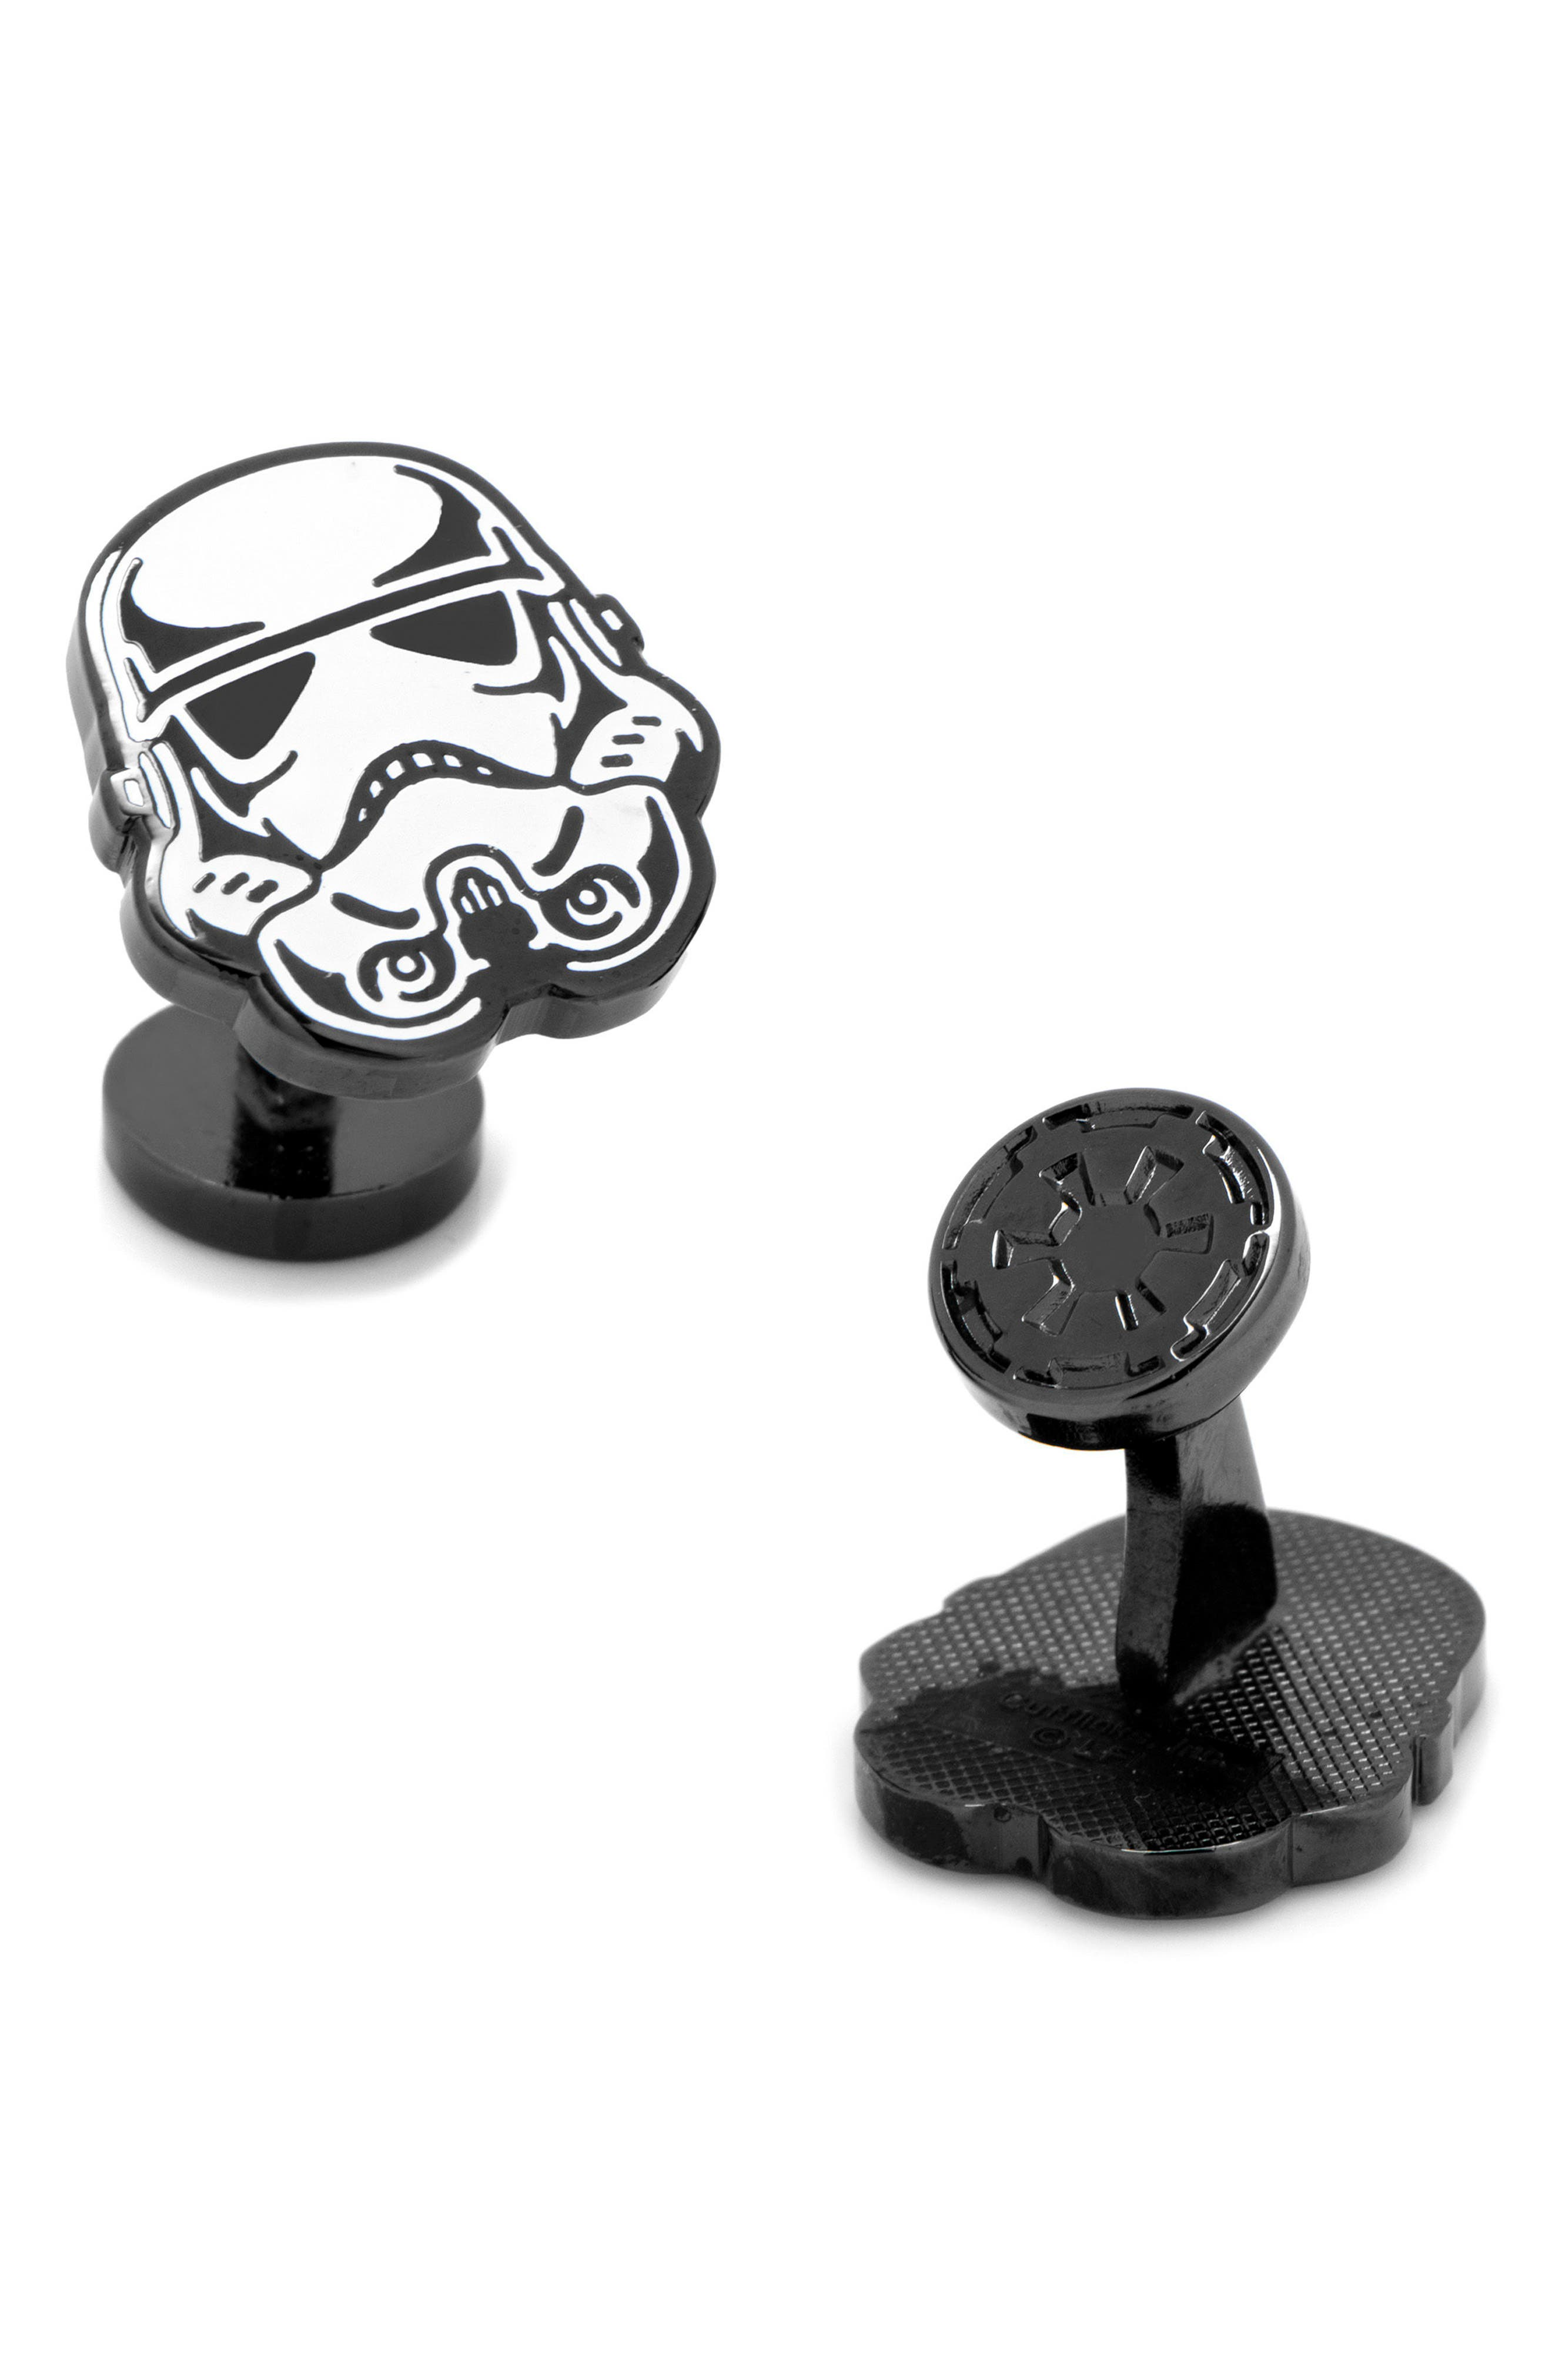 Star Wars Glow in the Dark Stormtrooper Cuff Links,                             Main thumbnail 1, color,                             MULTI